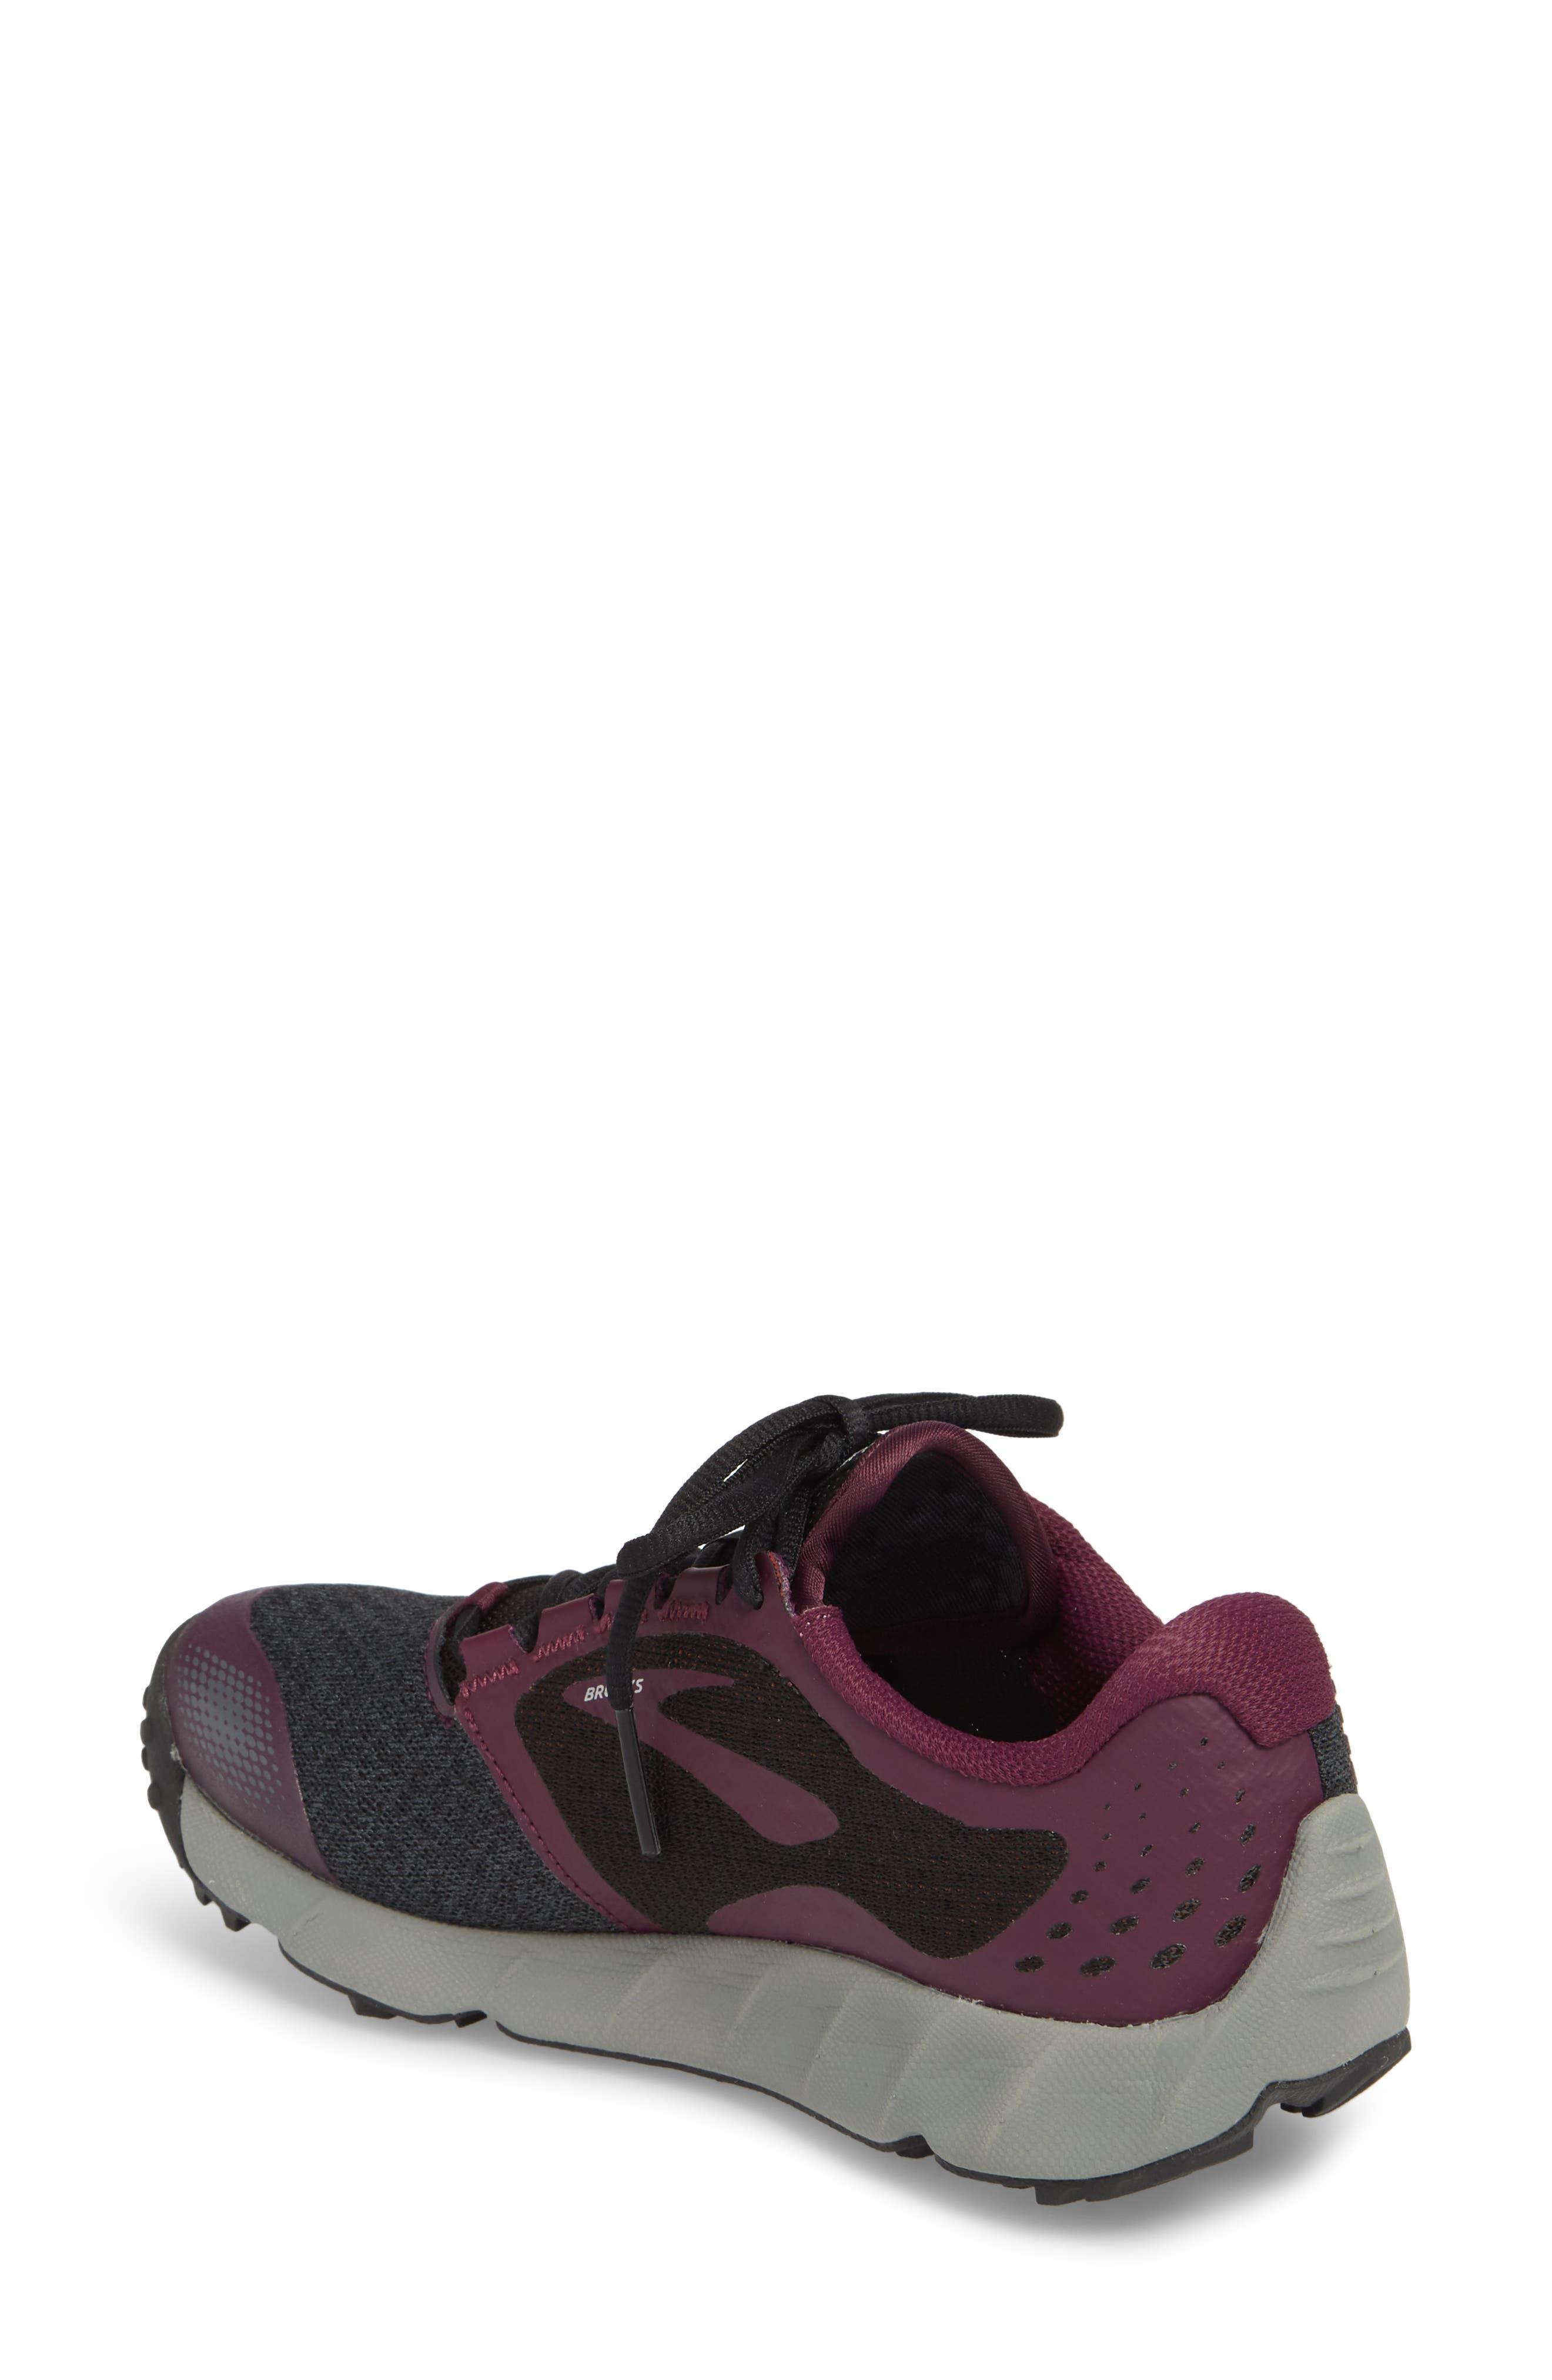 PureGrit 7 Trail Running Shoe,                             Alternate thumbnail 2, color,                             BLACK/ PURPLE/ GREY